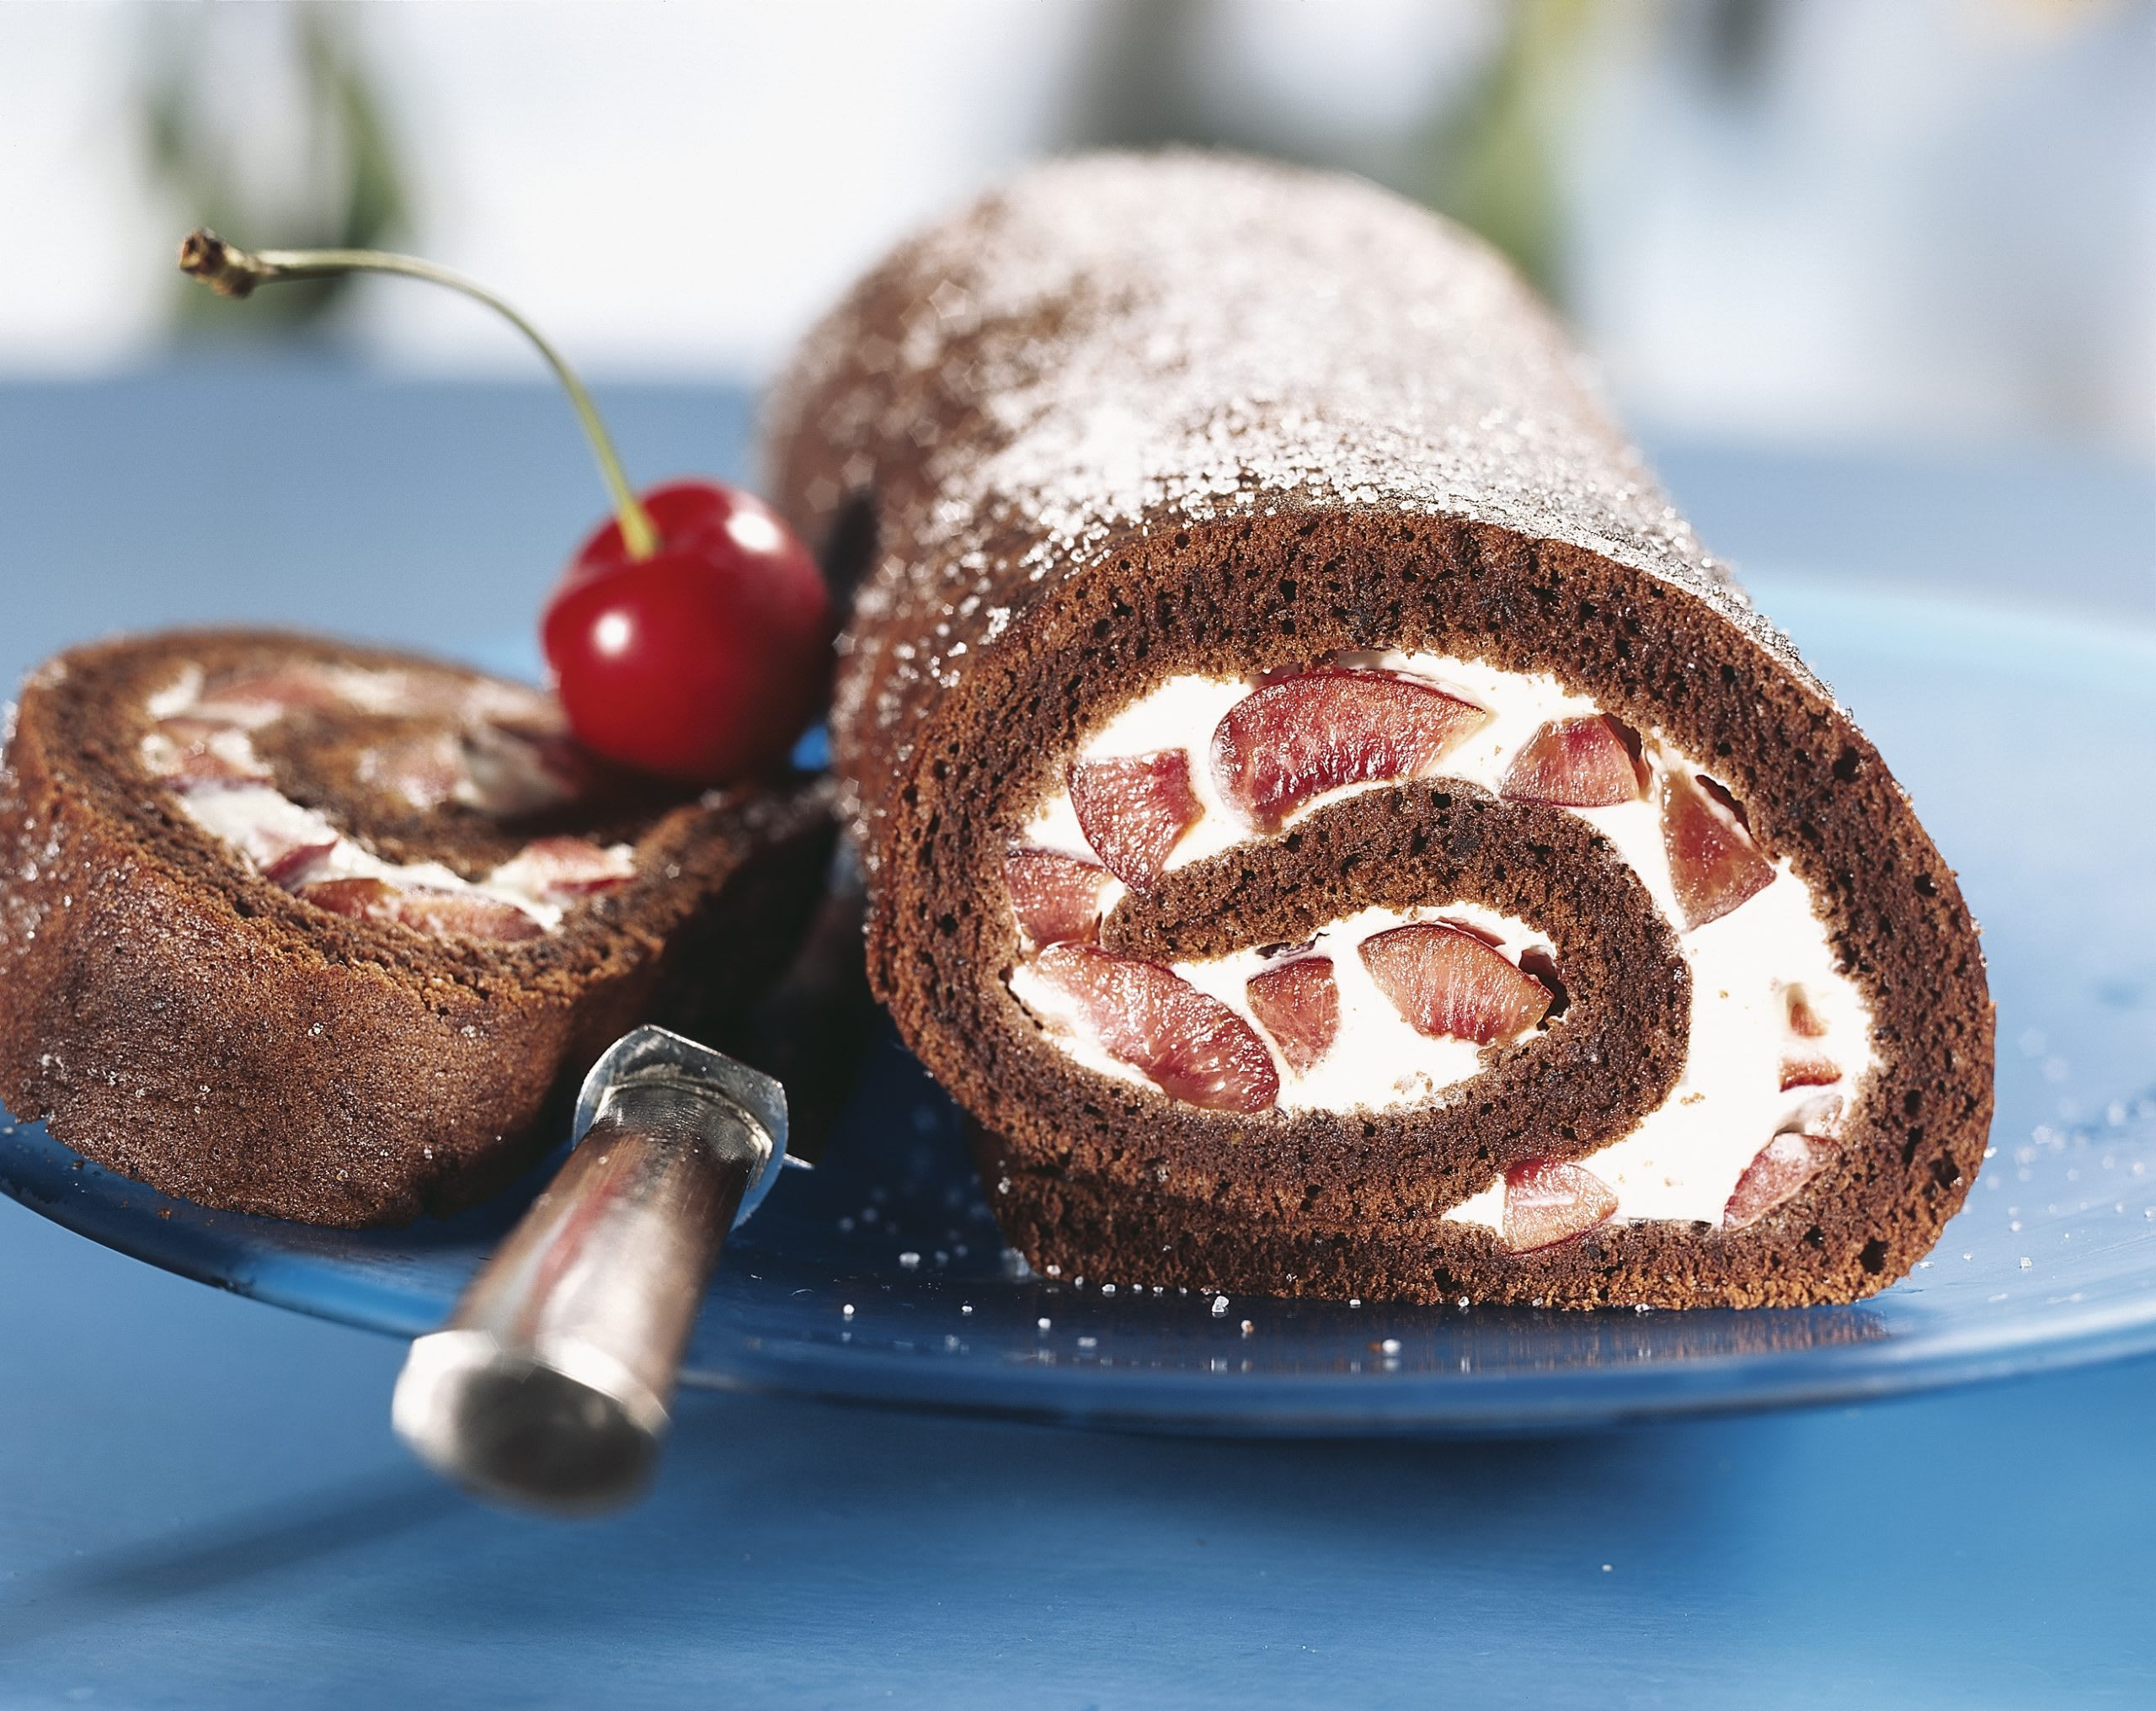 Schokolade-Kirschen-Roulade